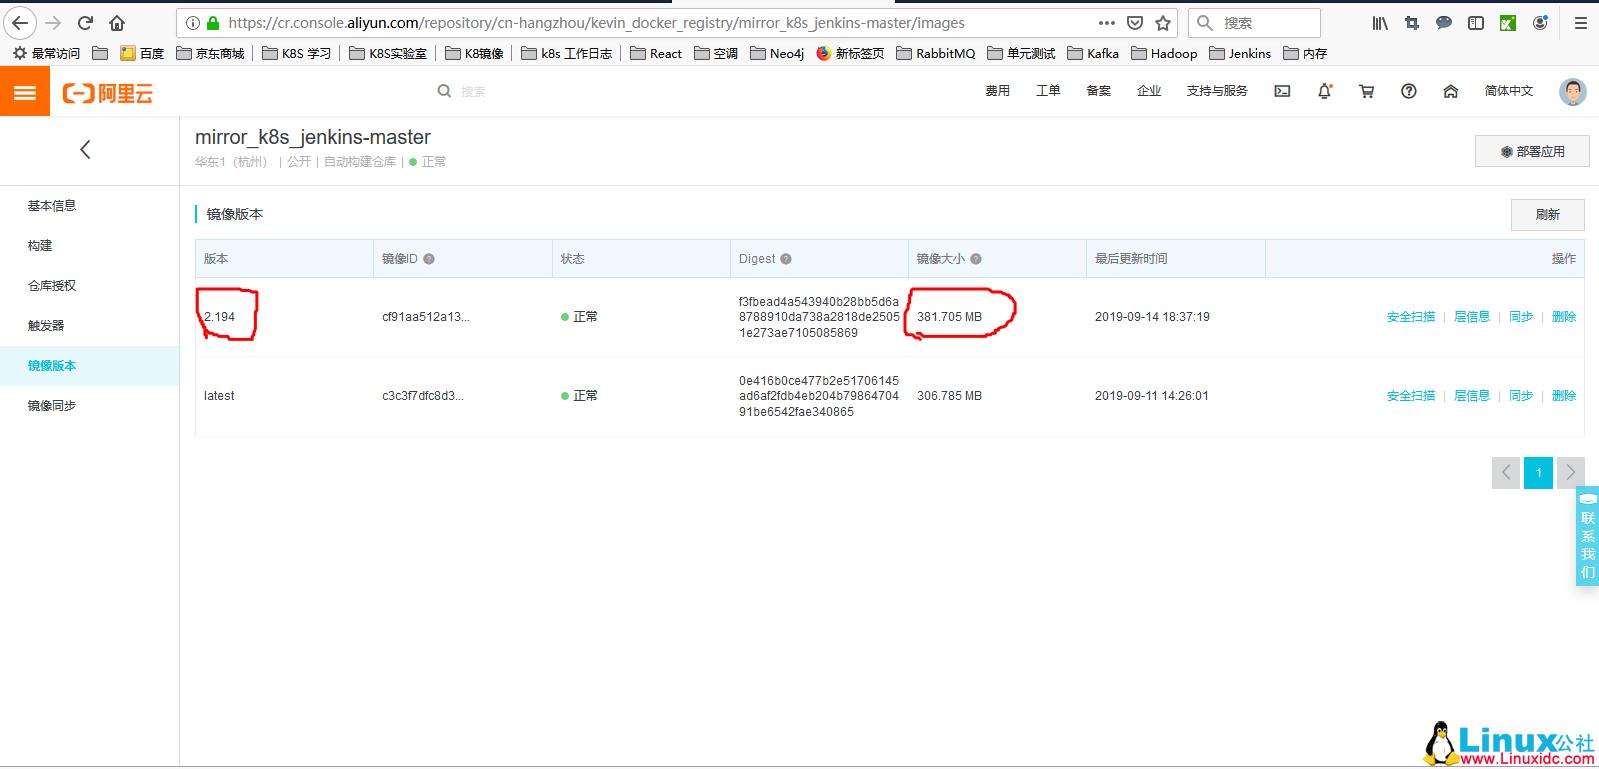 Dockfile 生成Docker镜像文件大小的比较